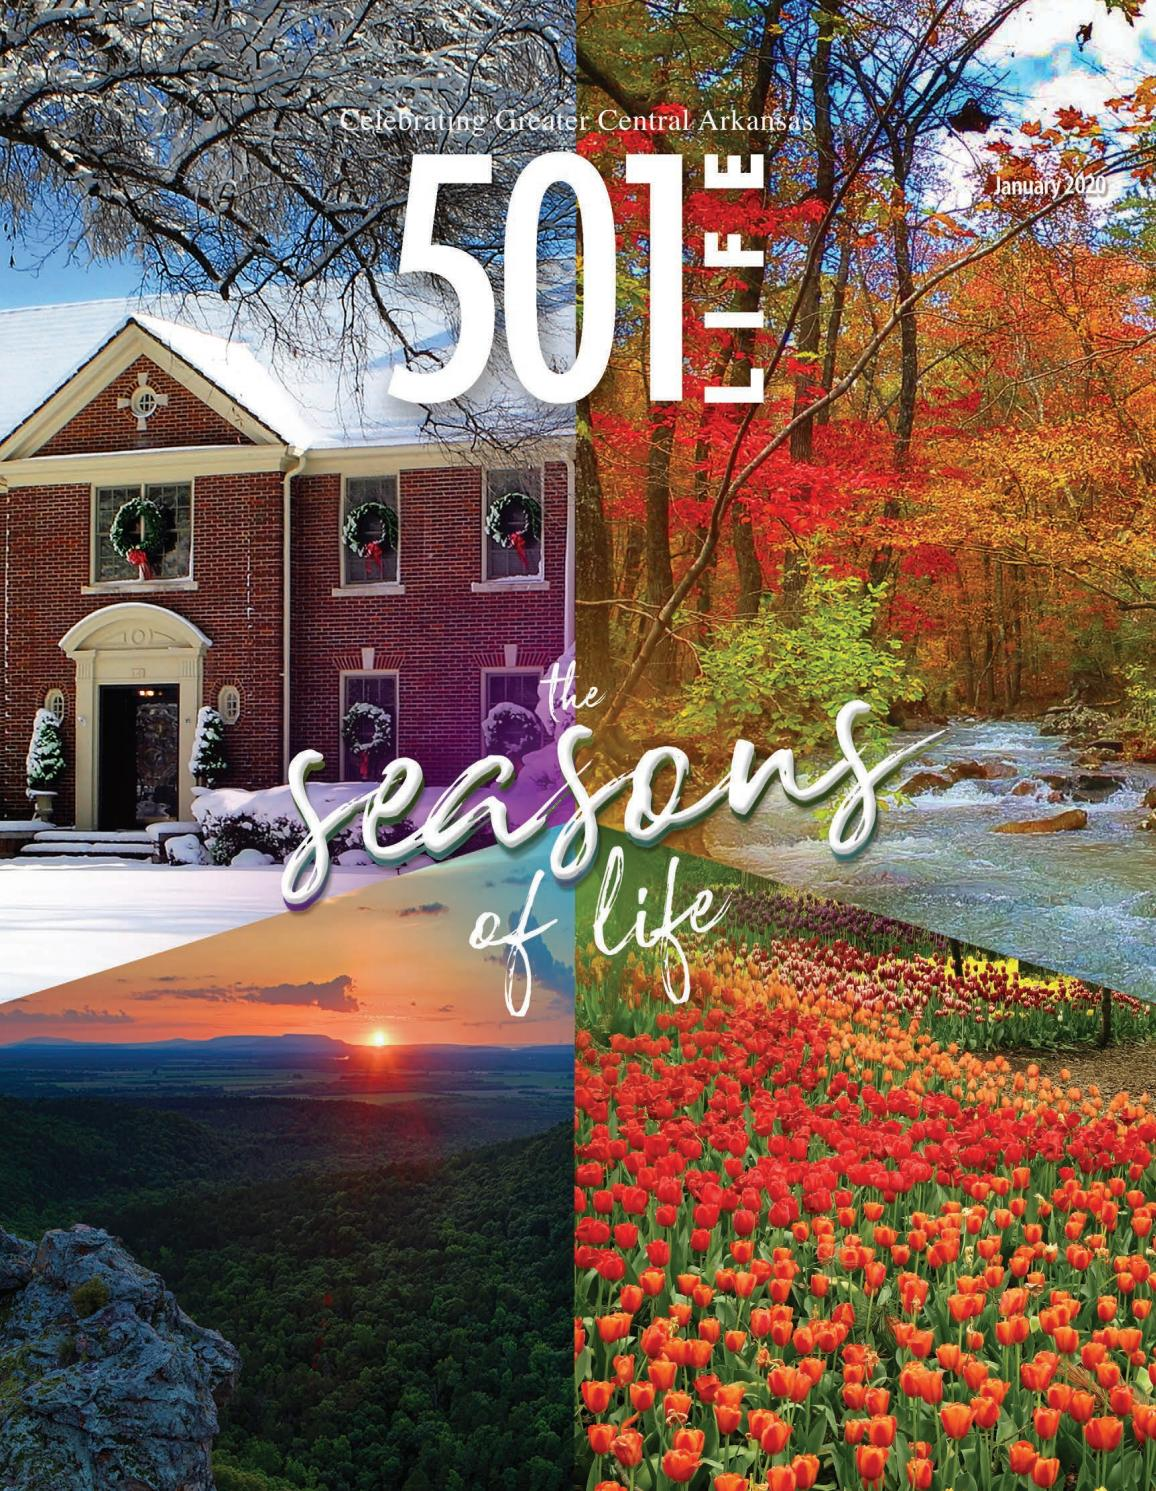 Skin Allergies Mount Nebo Arkansas Christmas 2020 January 2020 by 501 LIFE   issuu